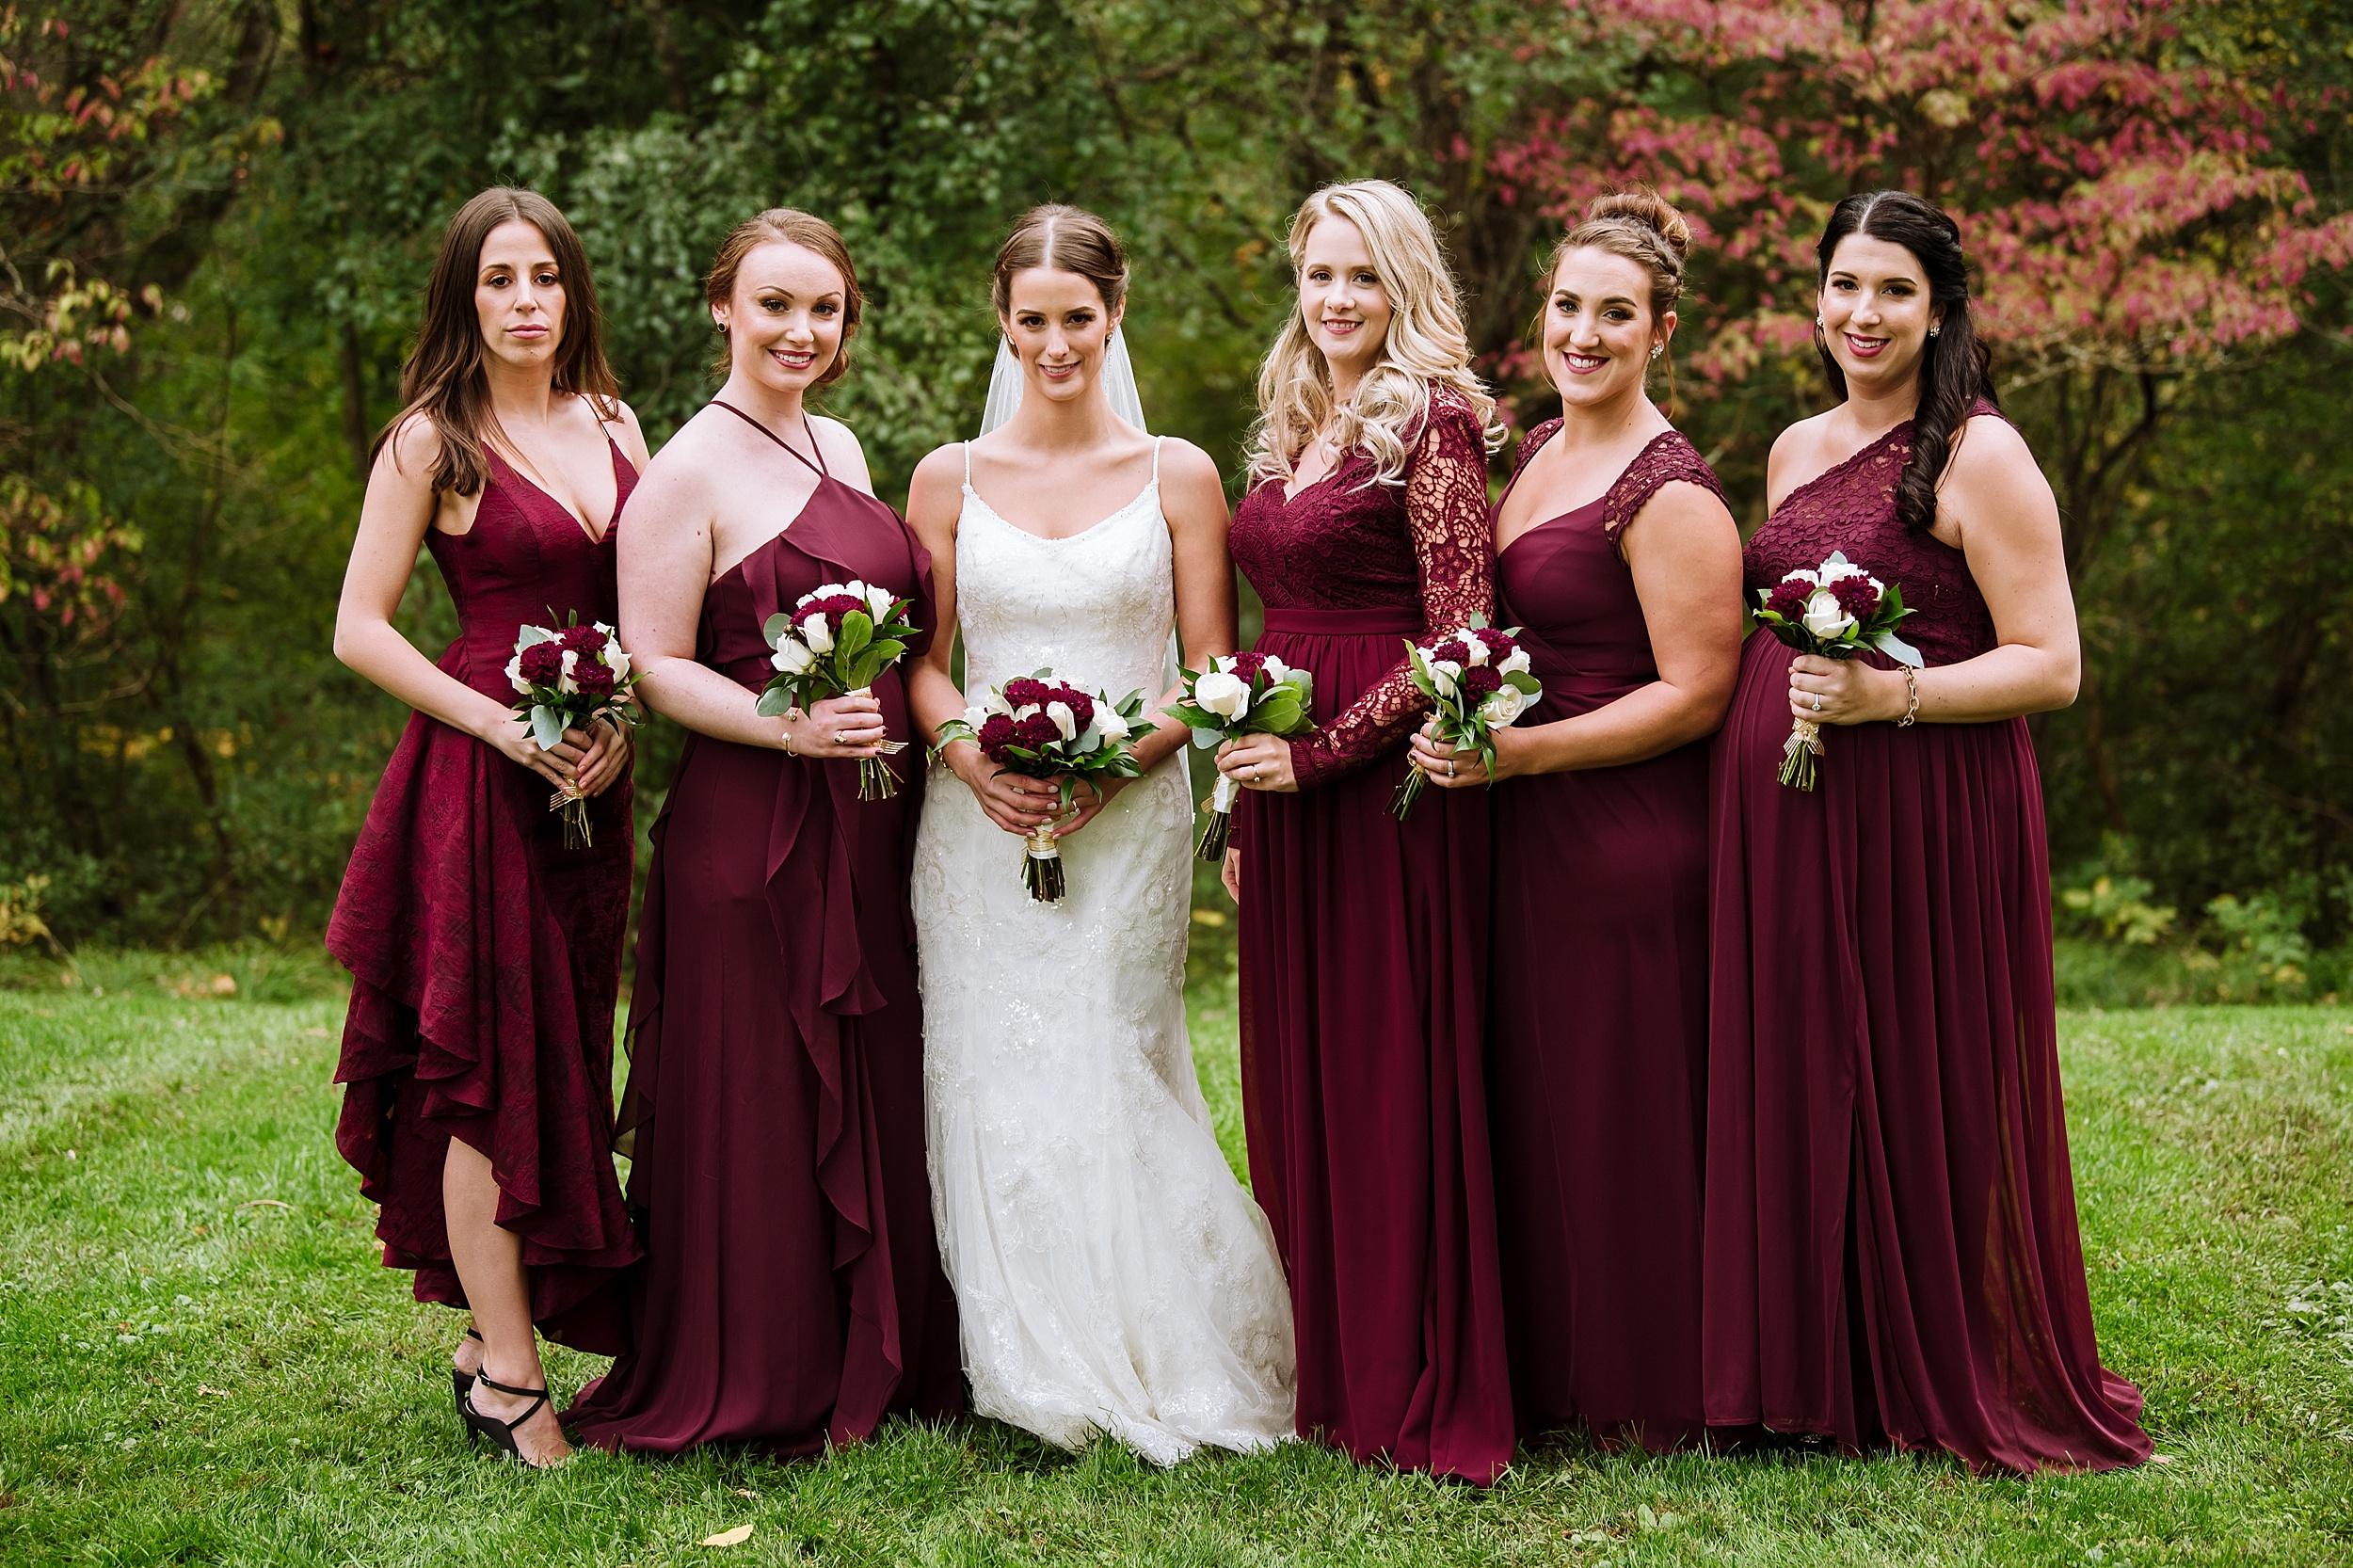 Windemere_Manor_Fall_Wedding_London_Toronto_Wedding_Photographer_0032.jpg